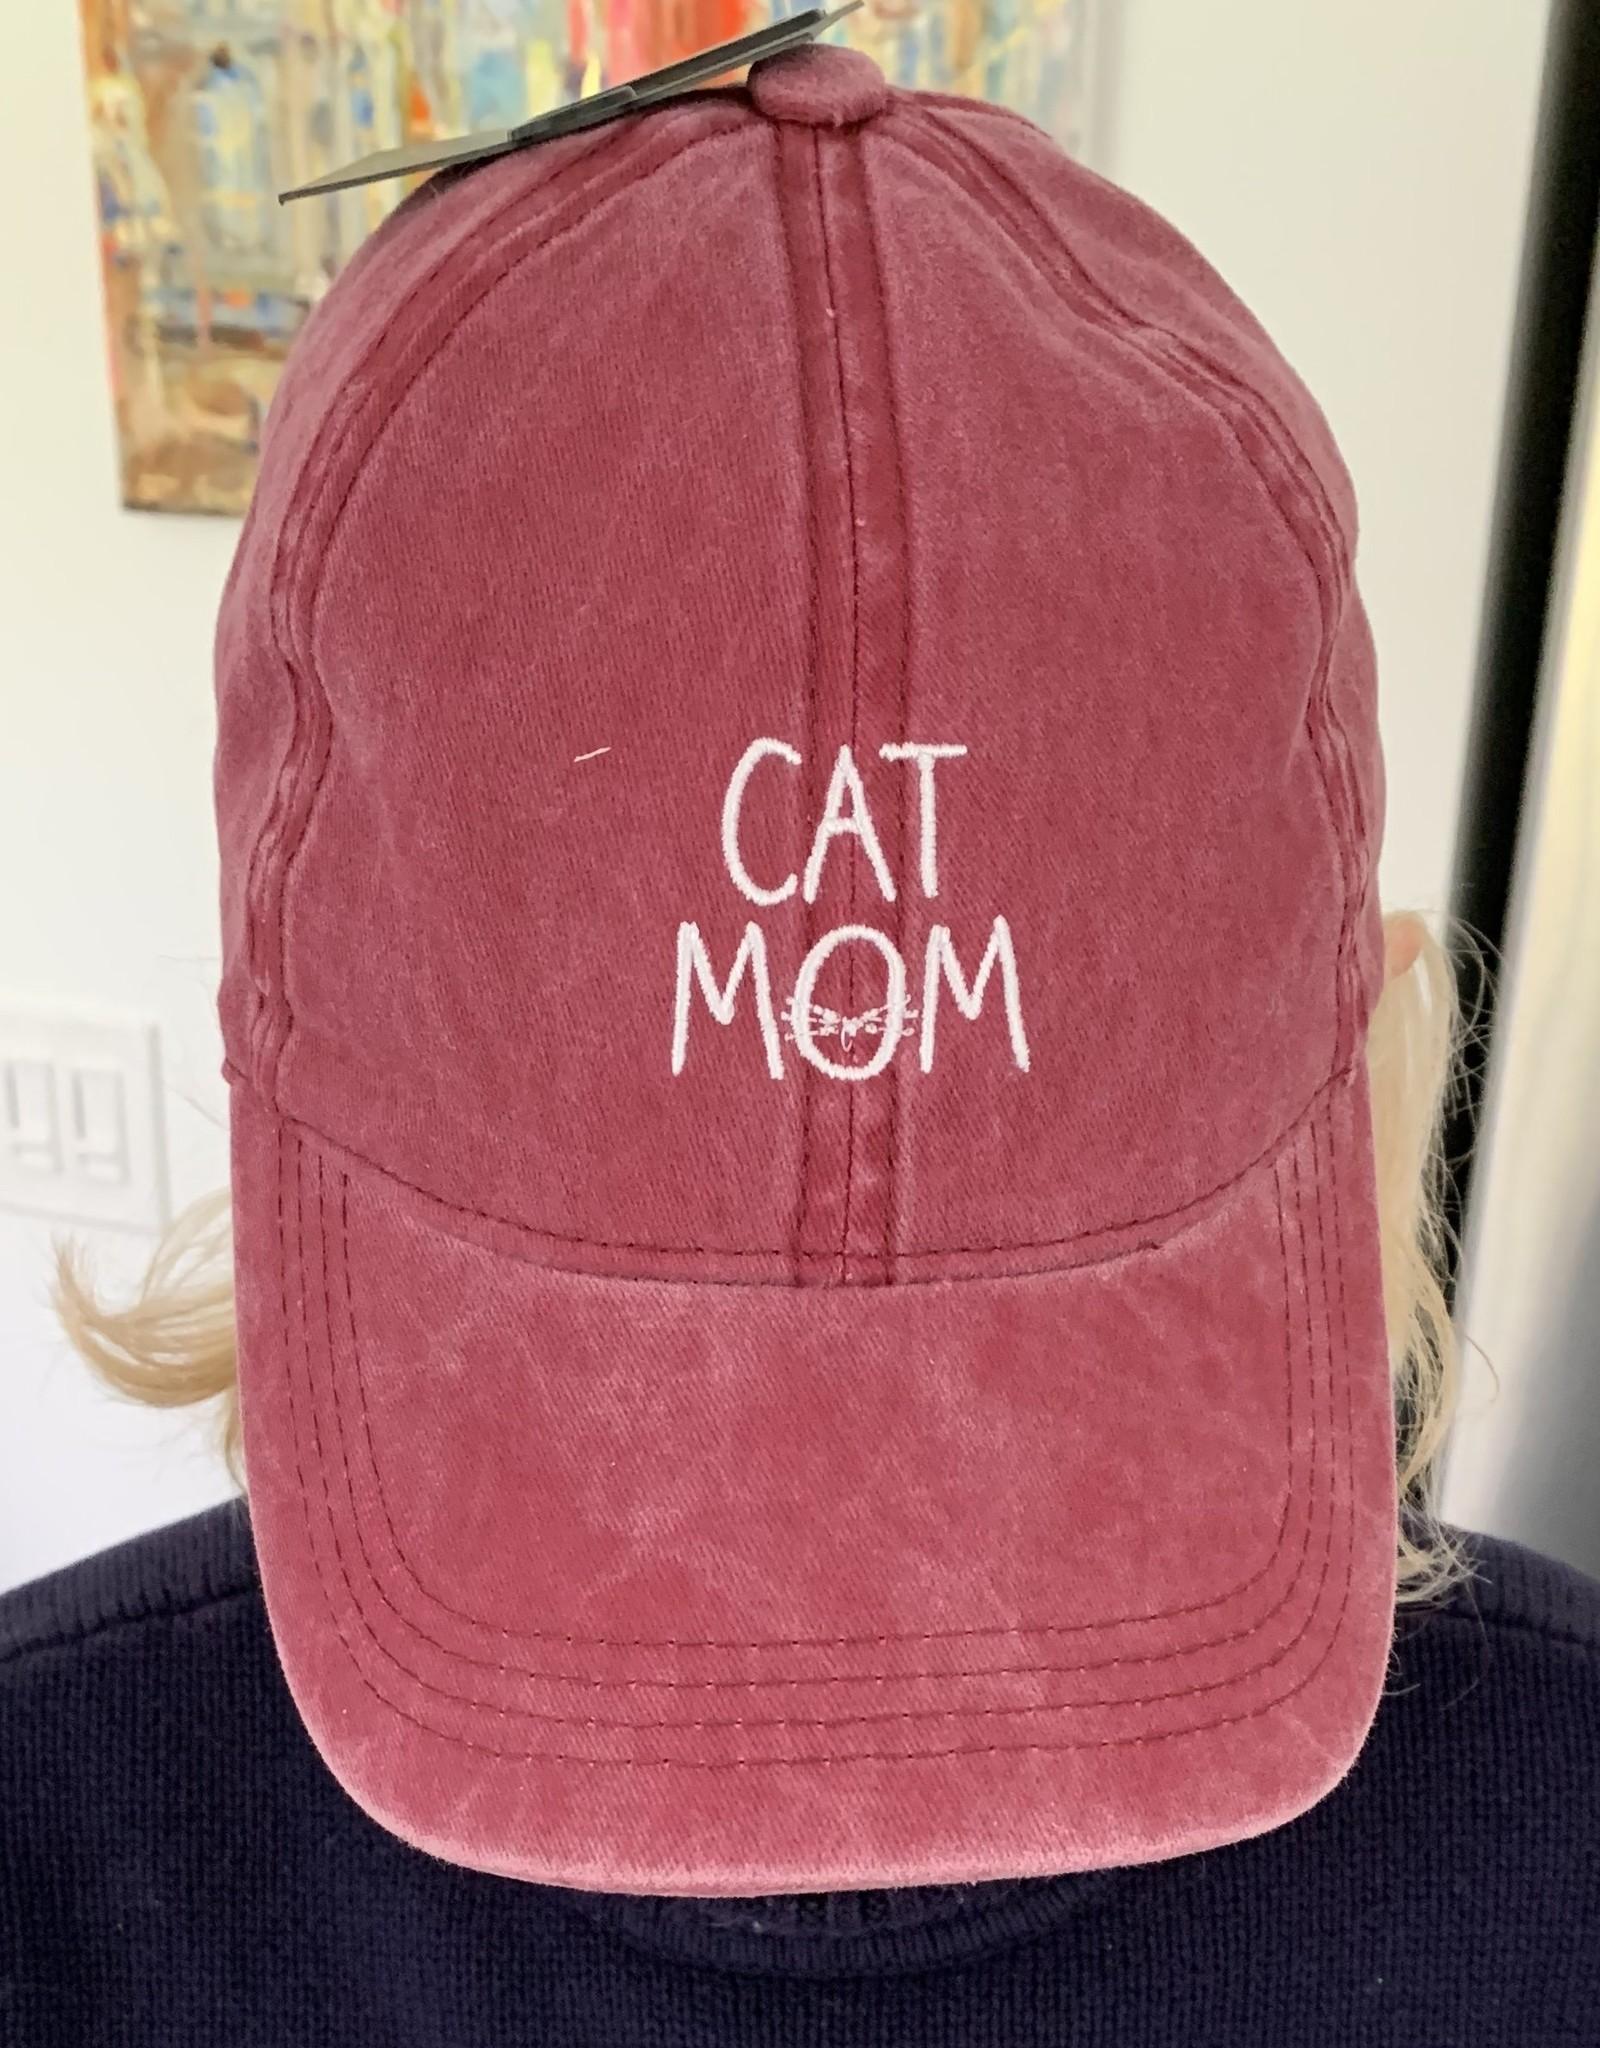 DAVID & YOUNG Cat Mom Baseball Cap